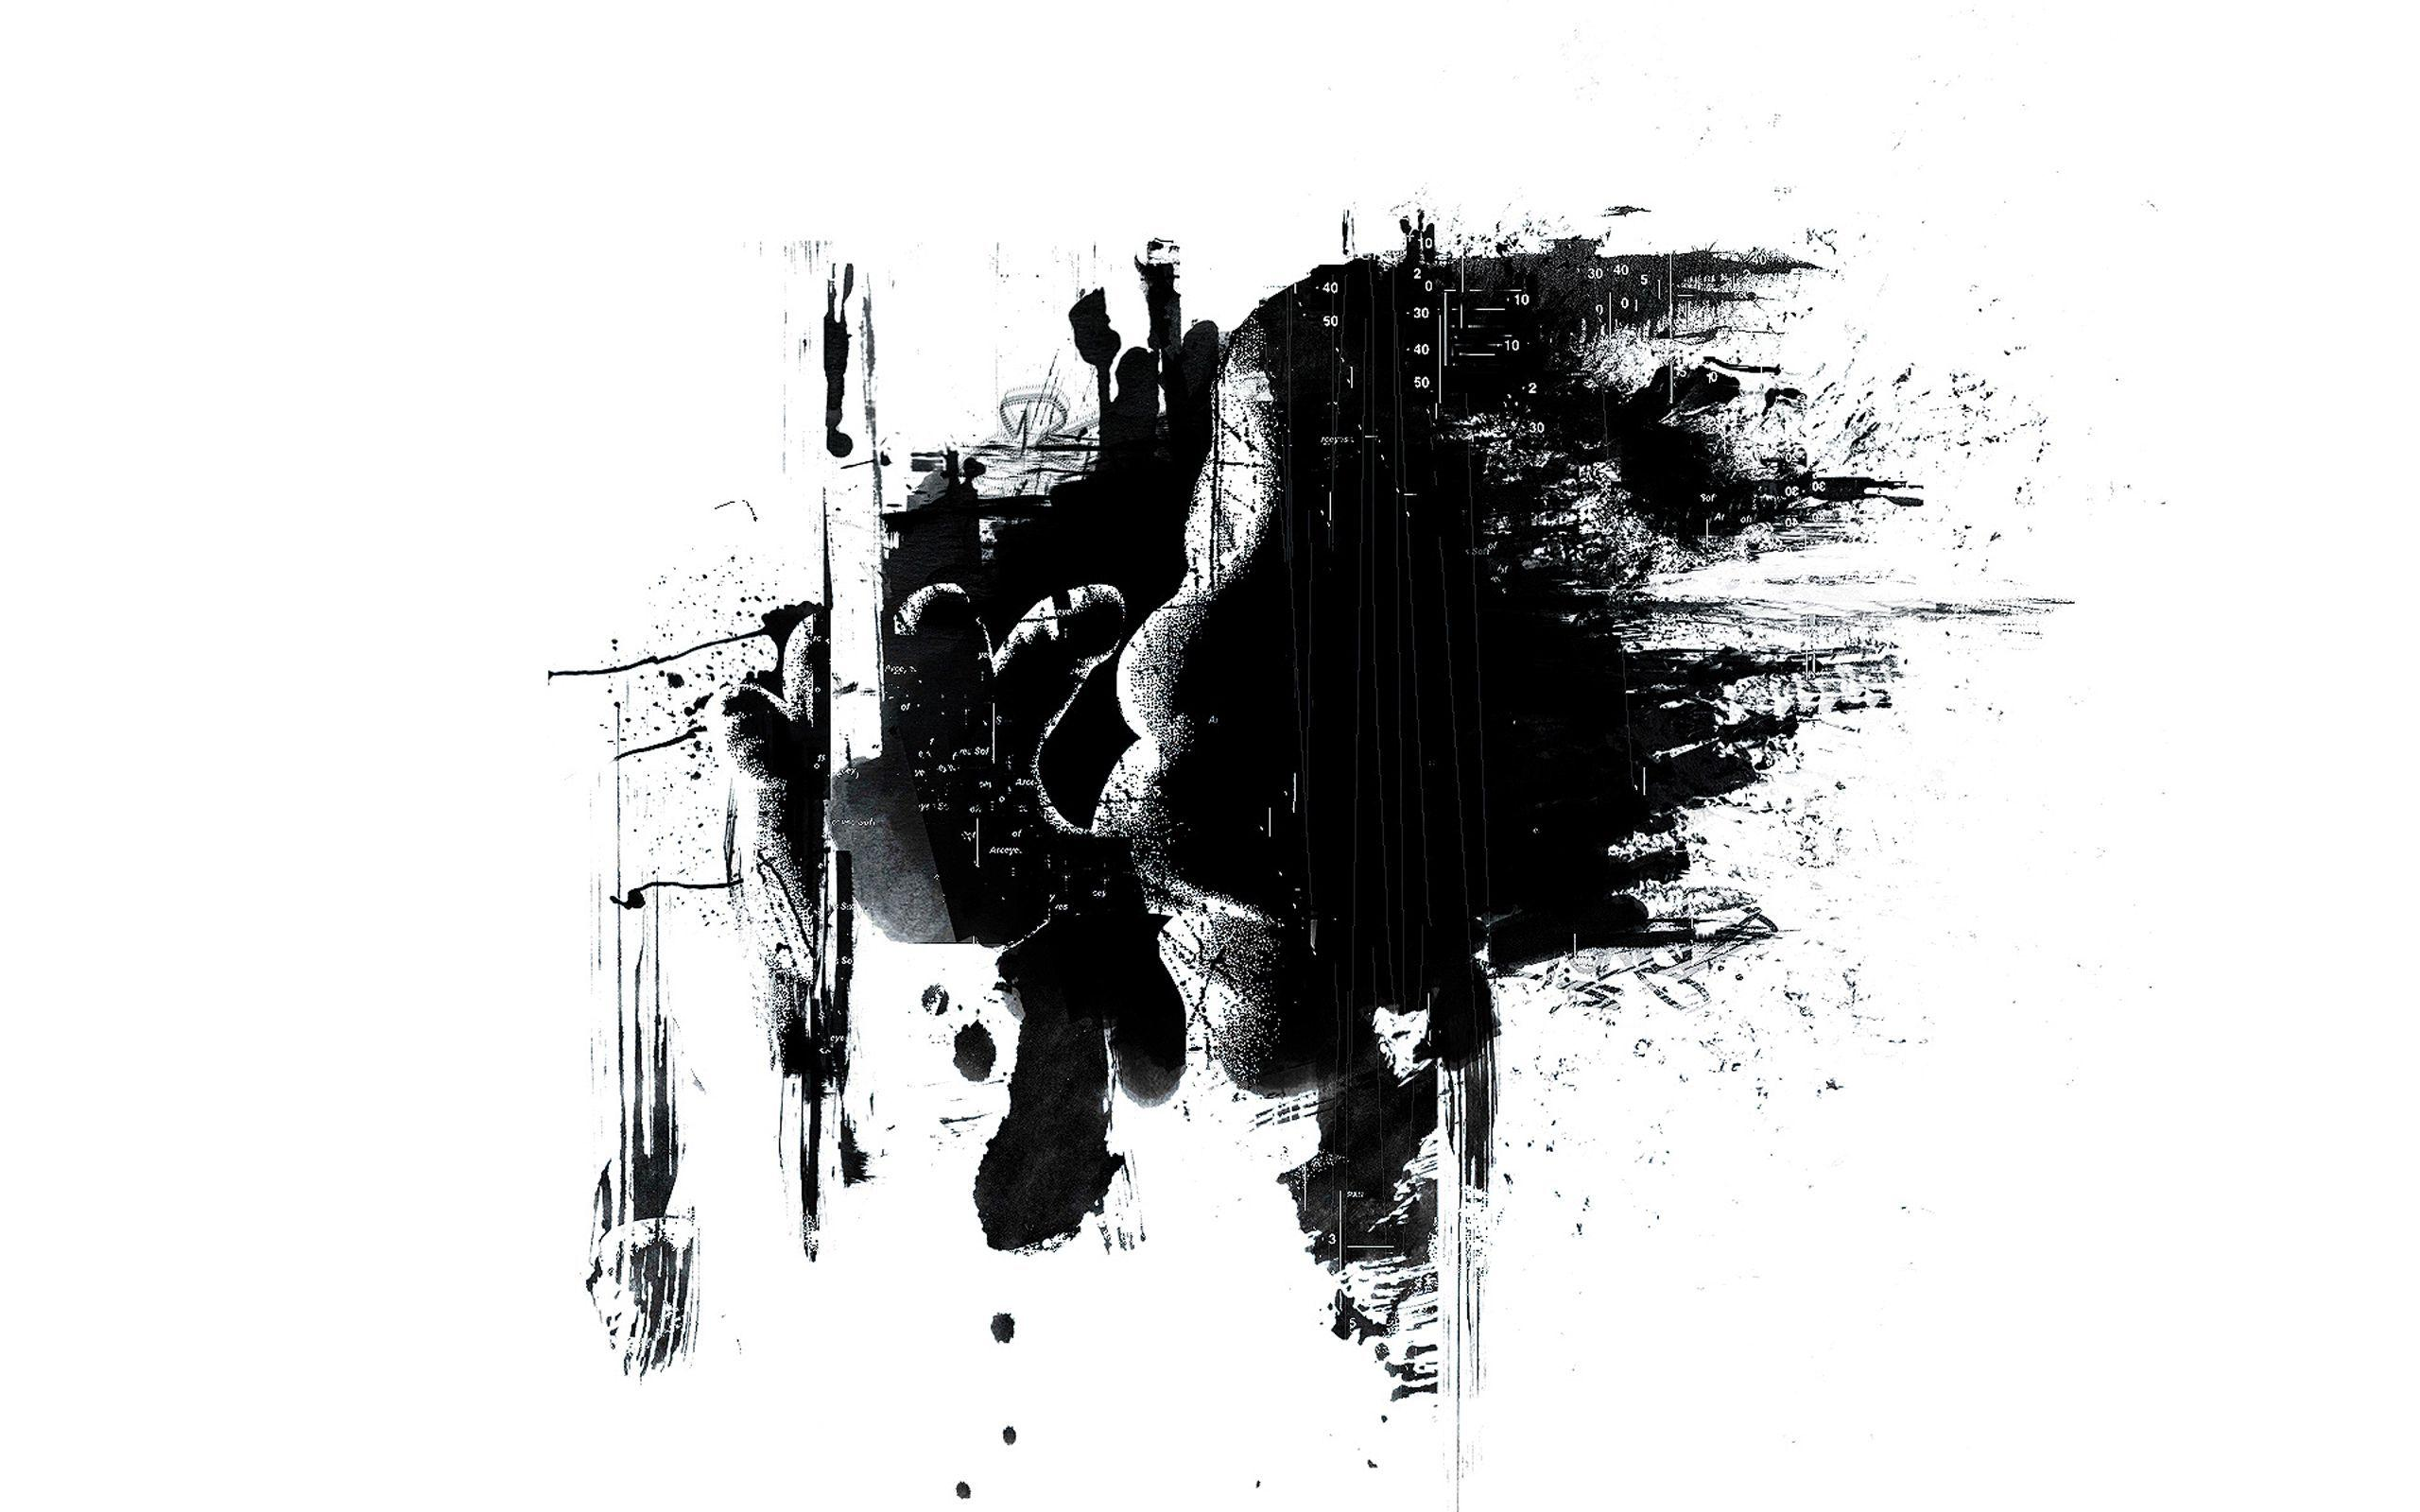 Black And White Splash Wallpapers 2560x1600